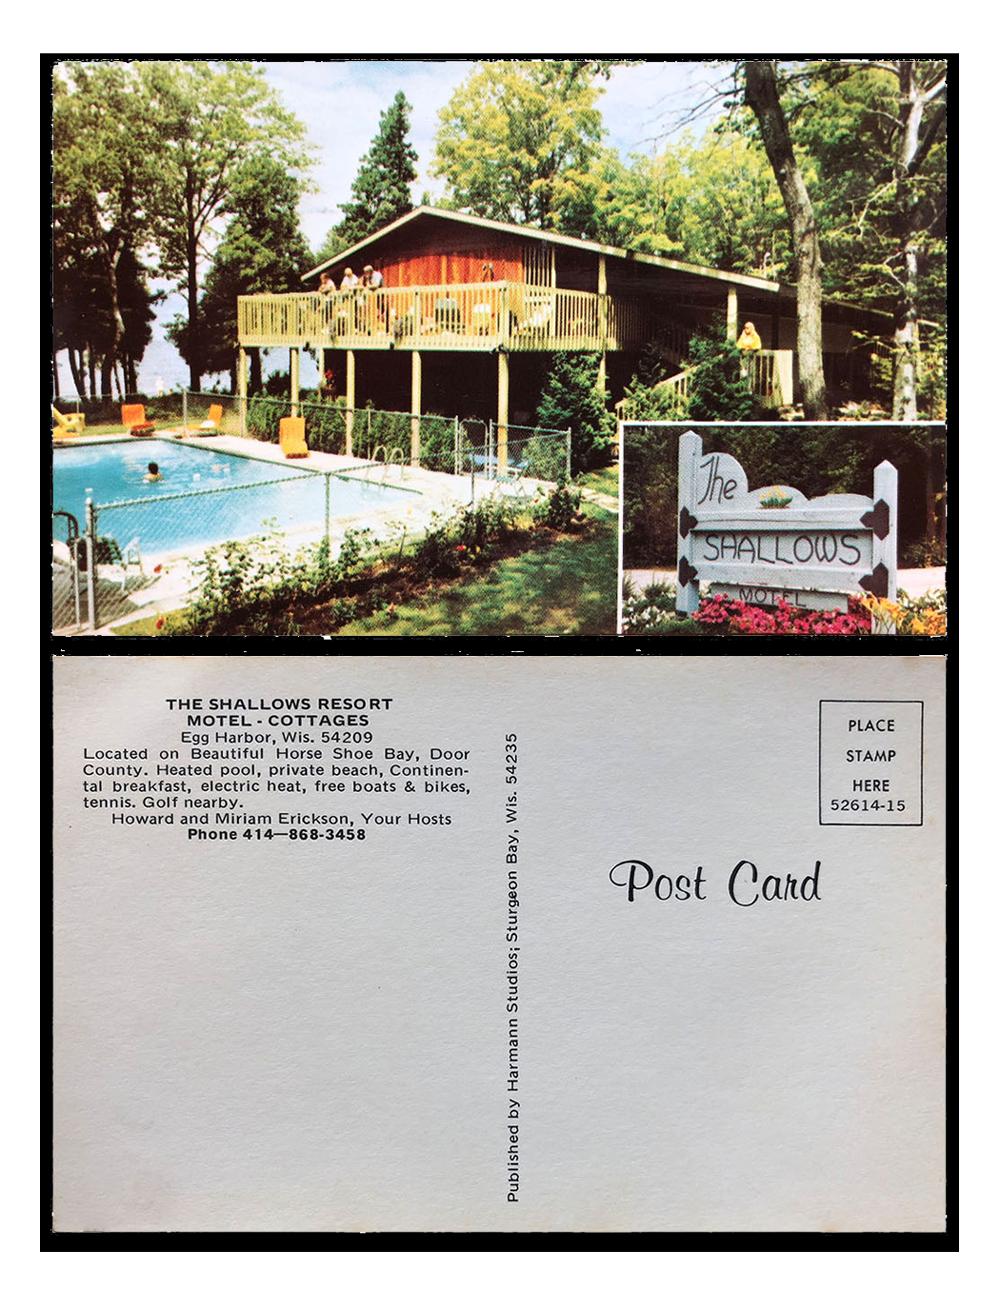 Vintage postcard of the Shallows Resort